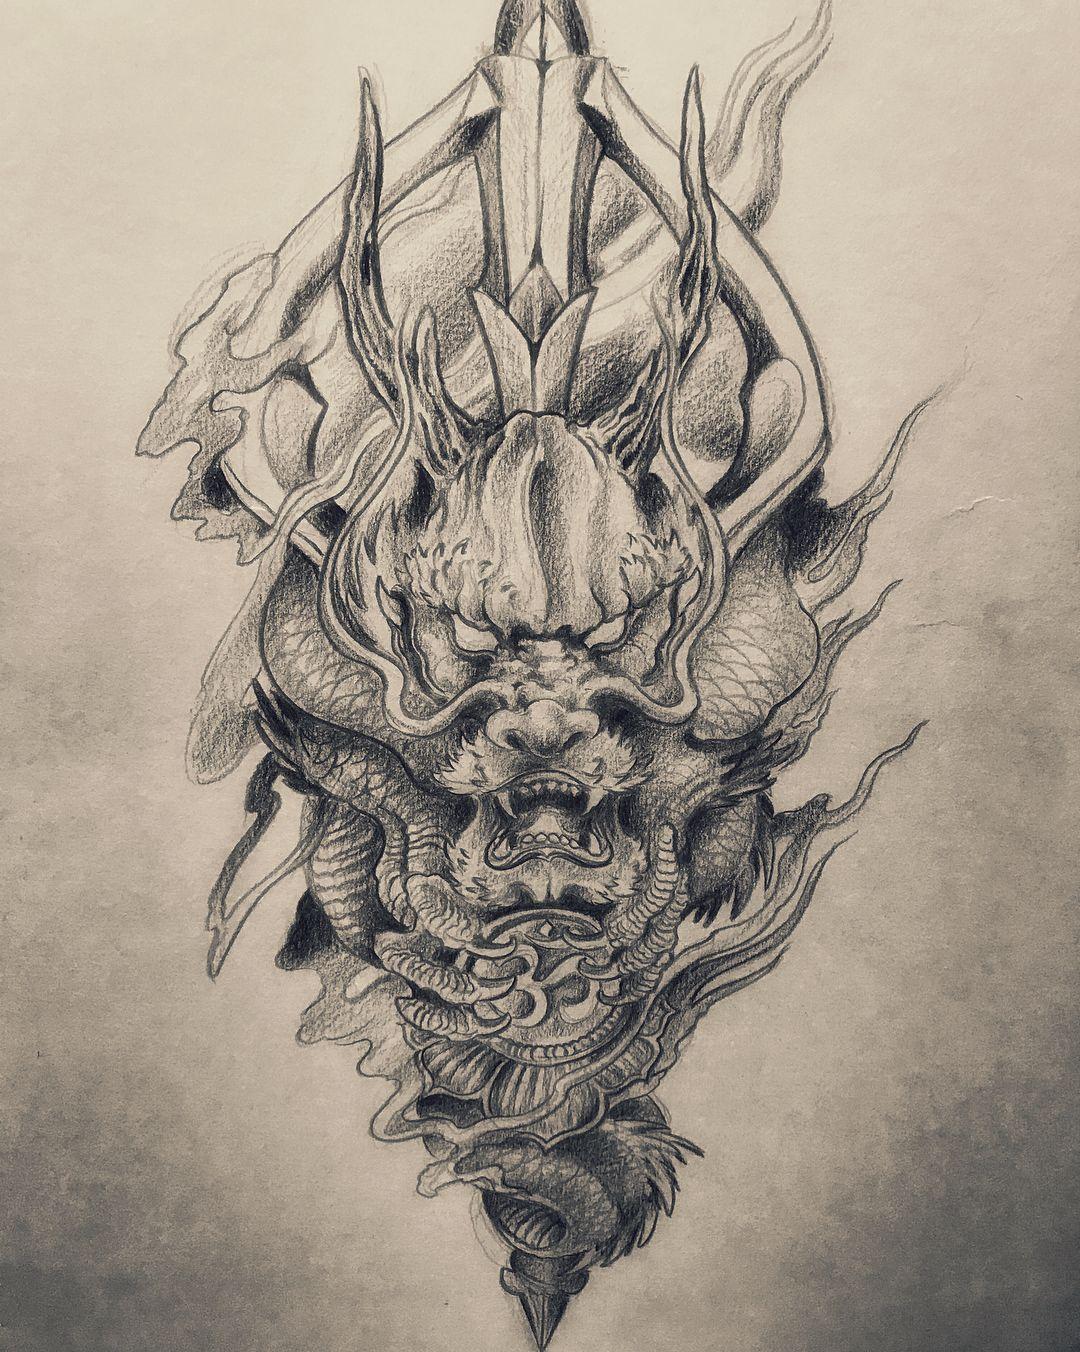 Black Or Red Sonneetattoo Dragontattoo Tattoodesign Japanesetattoo Easterntattoo Asiantattoo Dragon Head Tattoo Dragon Tattoo Drawing Japanese Tattoo